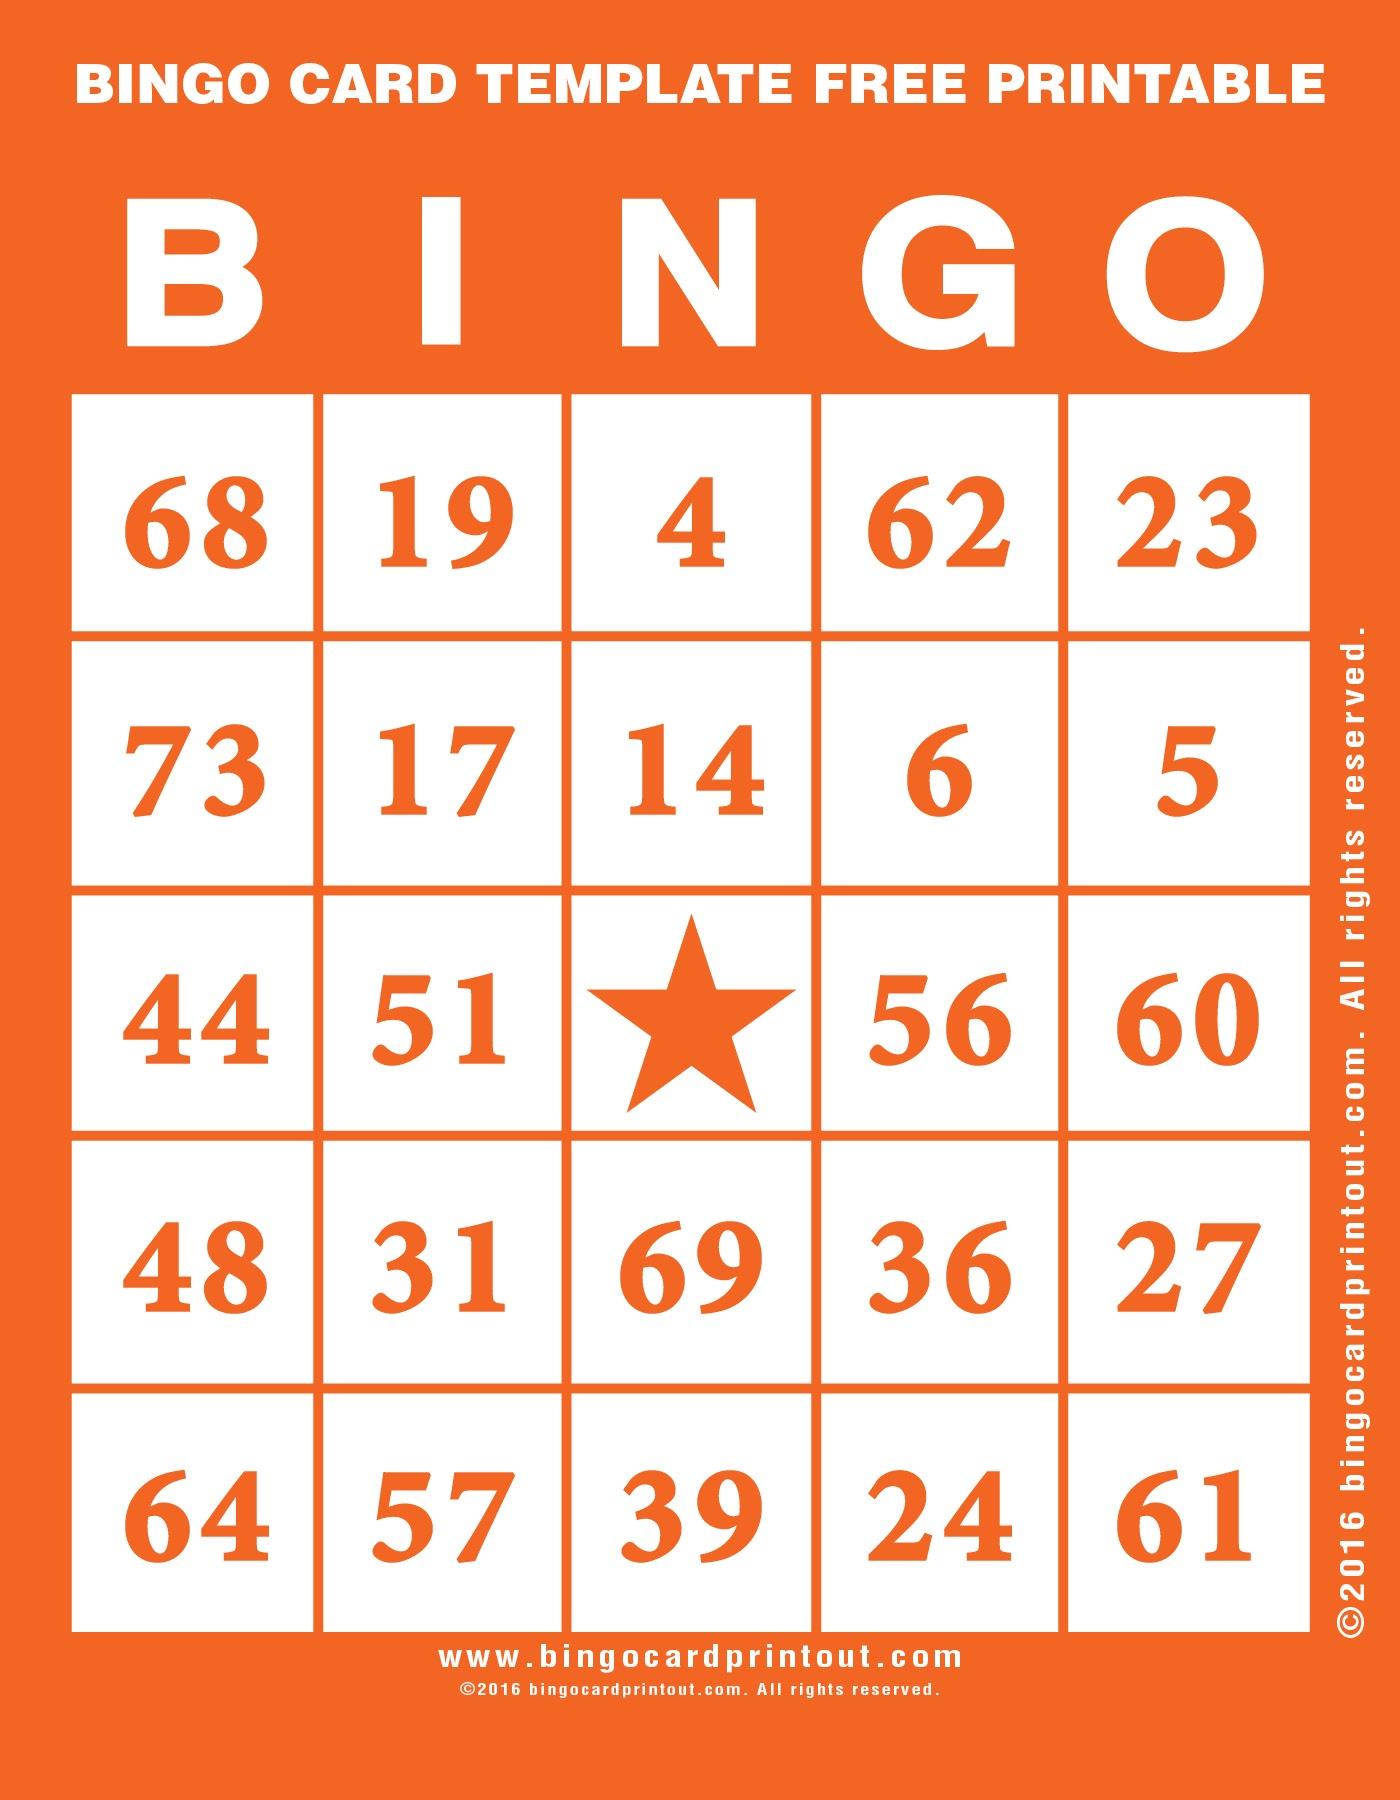 Bingo Card Template Free Printable - Bingocardprintout - Printable Bingo Template Free